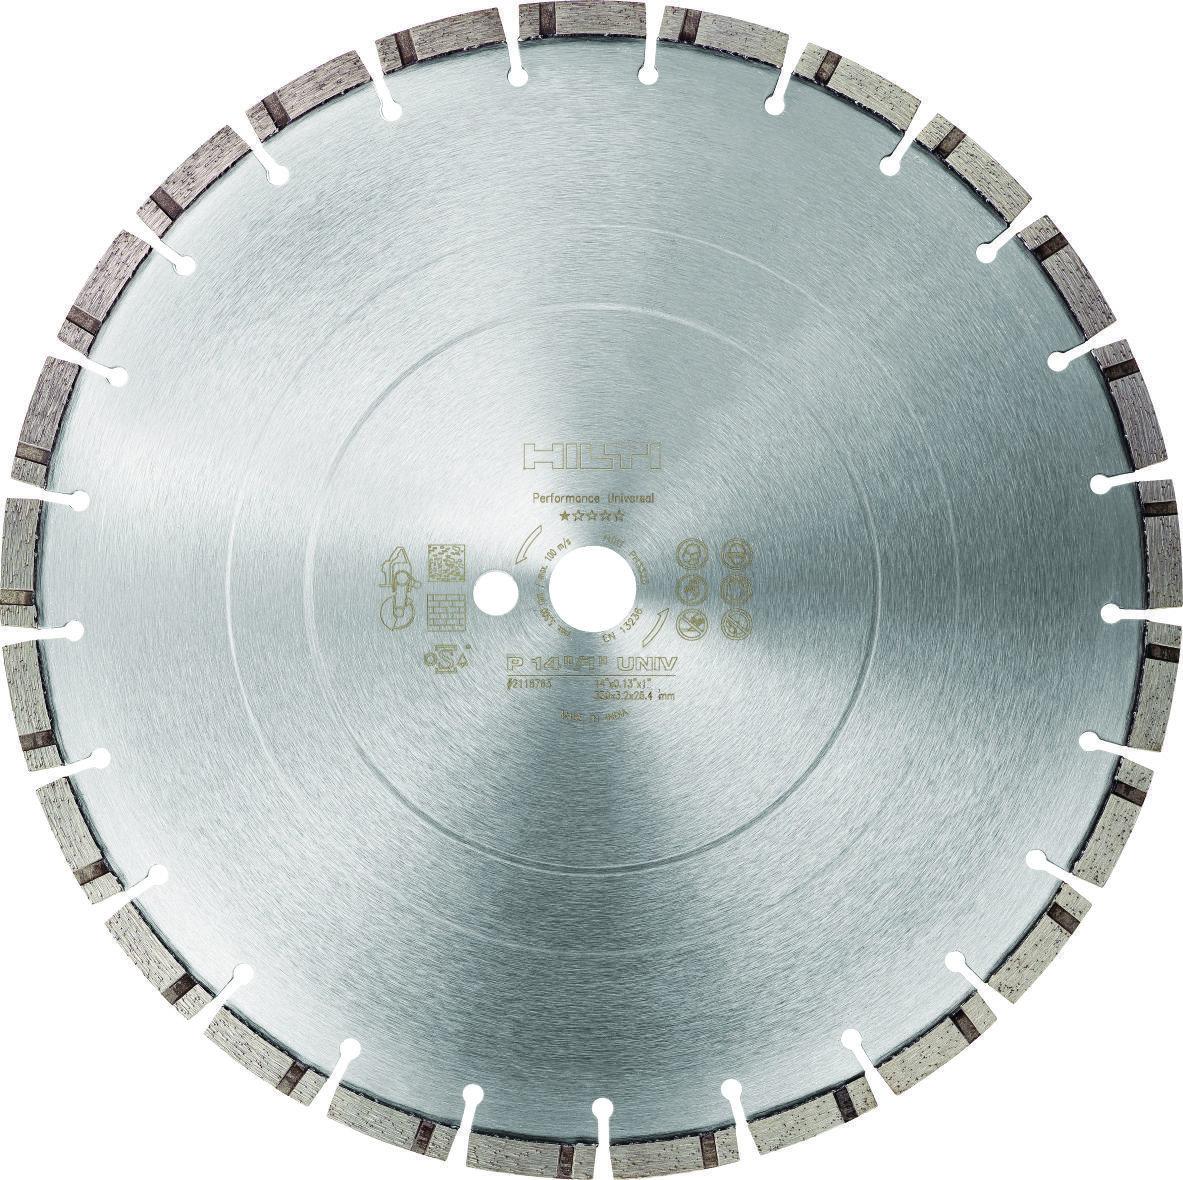 Hilti - Standard Diamond Blade 14